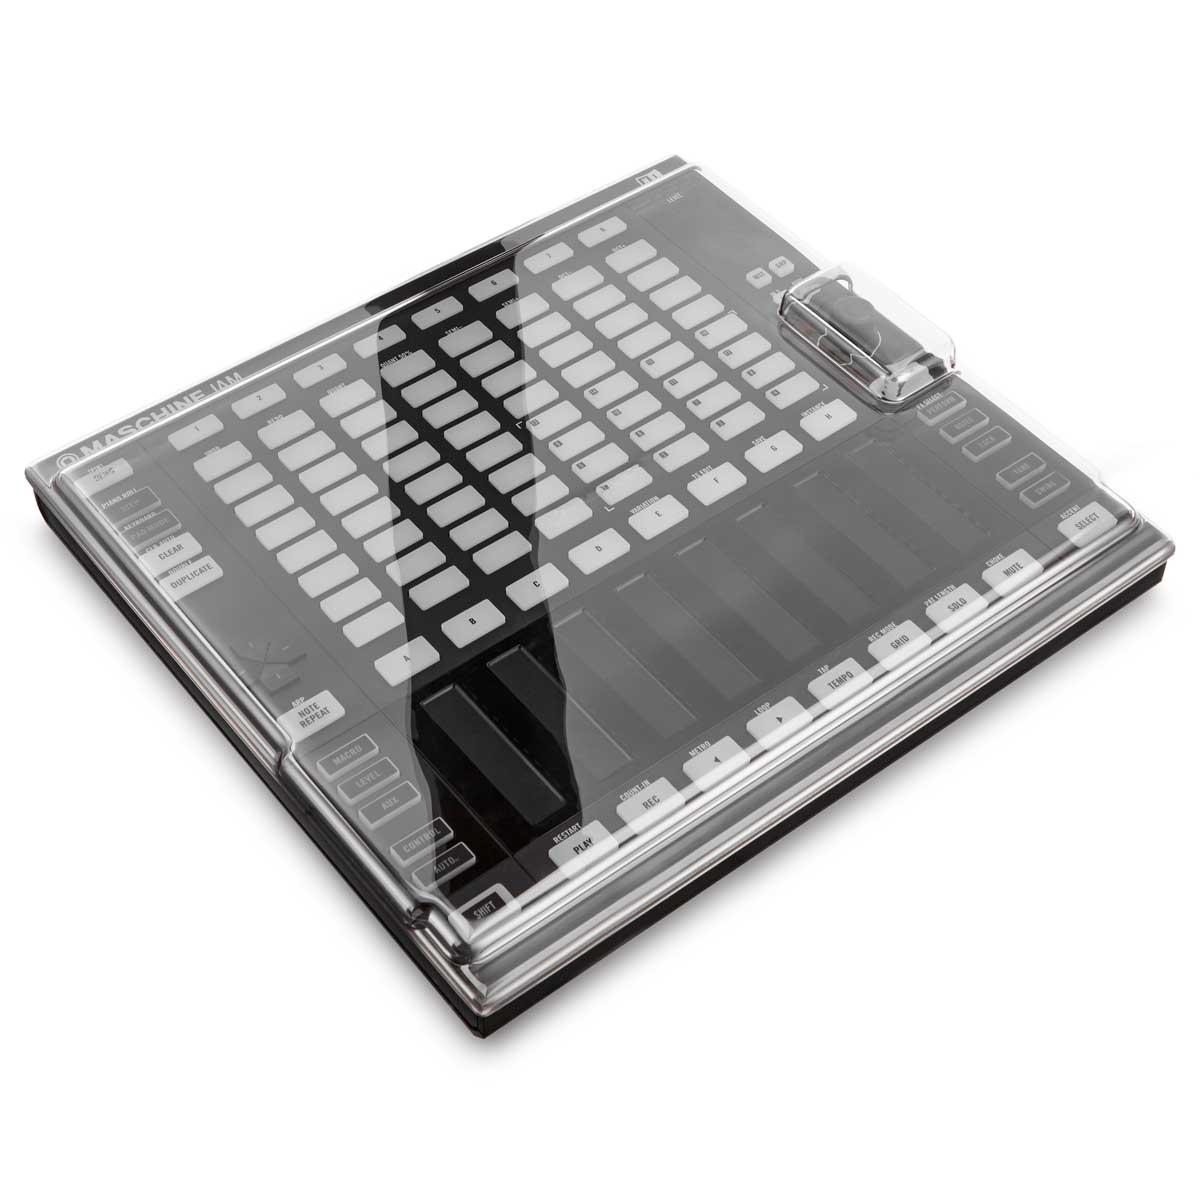 Decksaver デッキセーバー / DS-PC-MASCHINEJAM MASCHINE JAM用保護カバー【お取り寄せ商品】